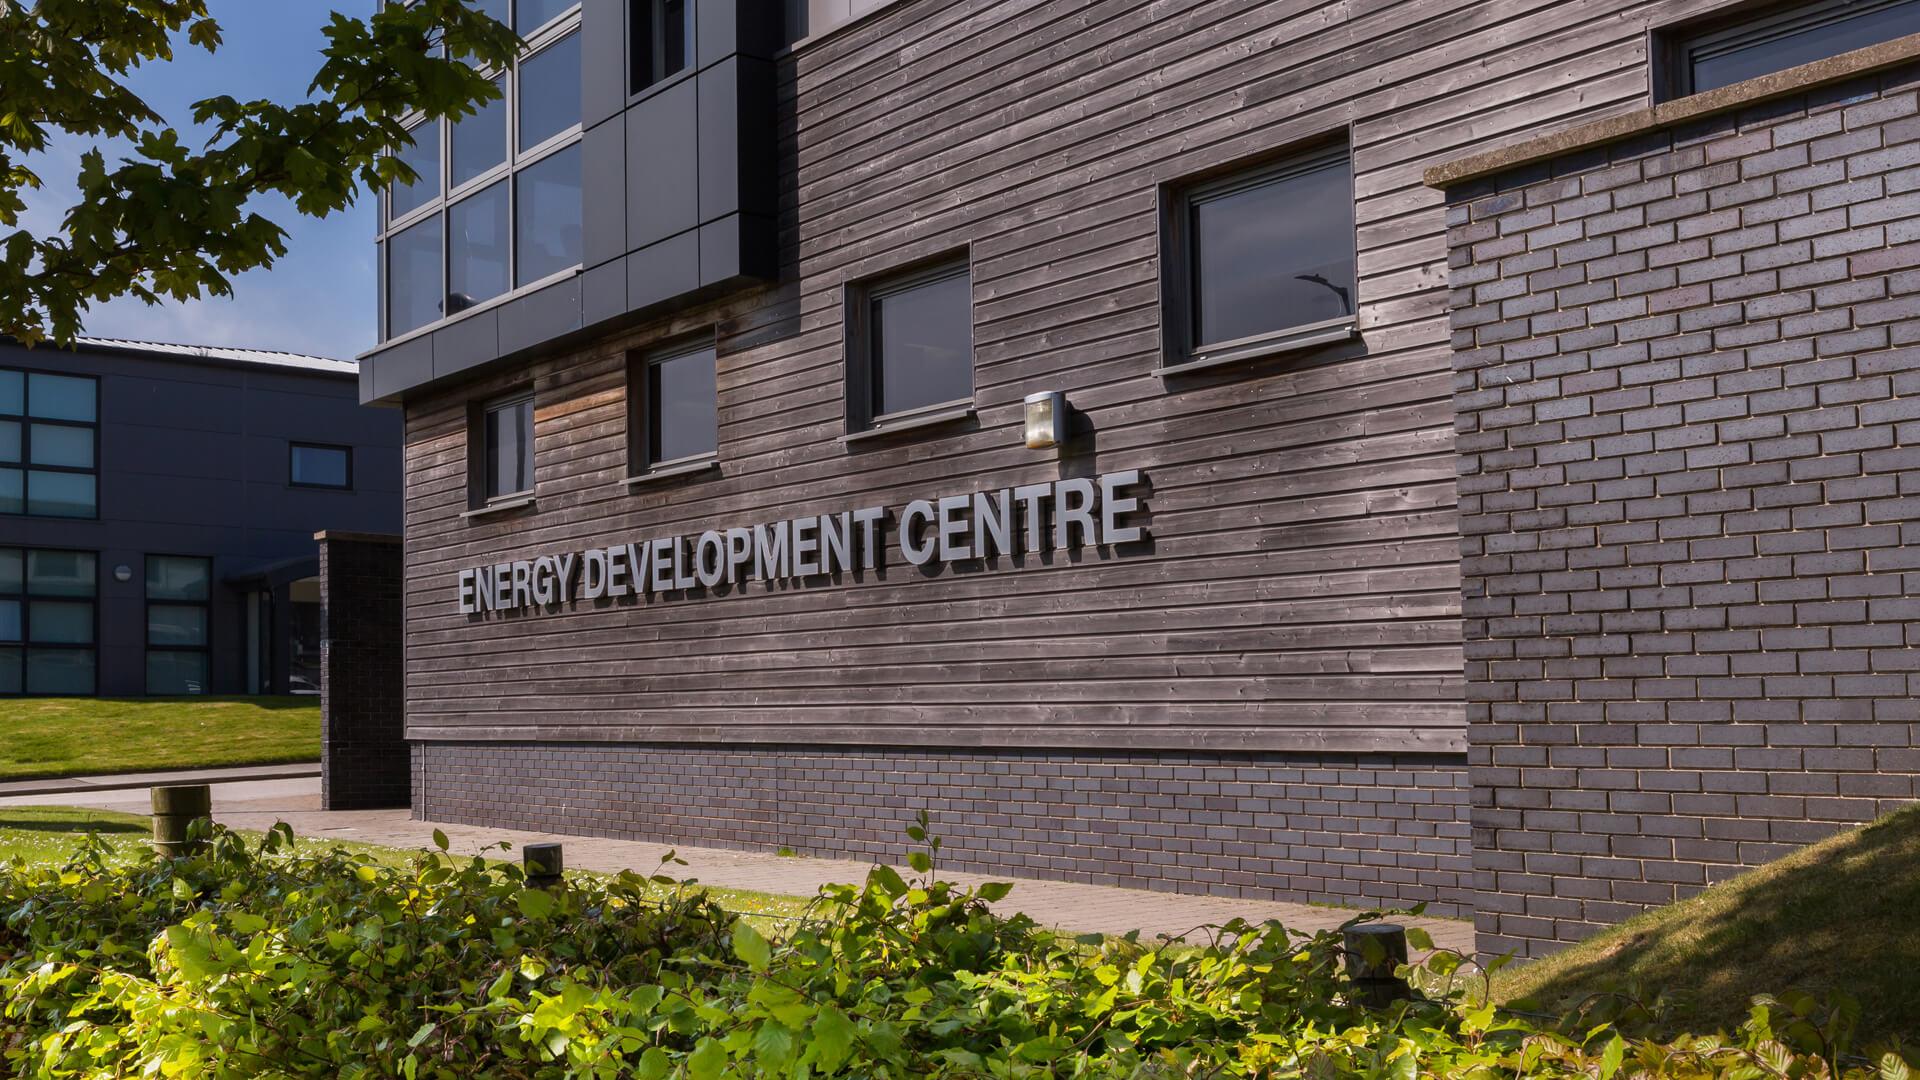 Energy Development Centre